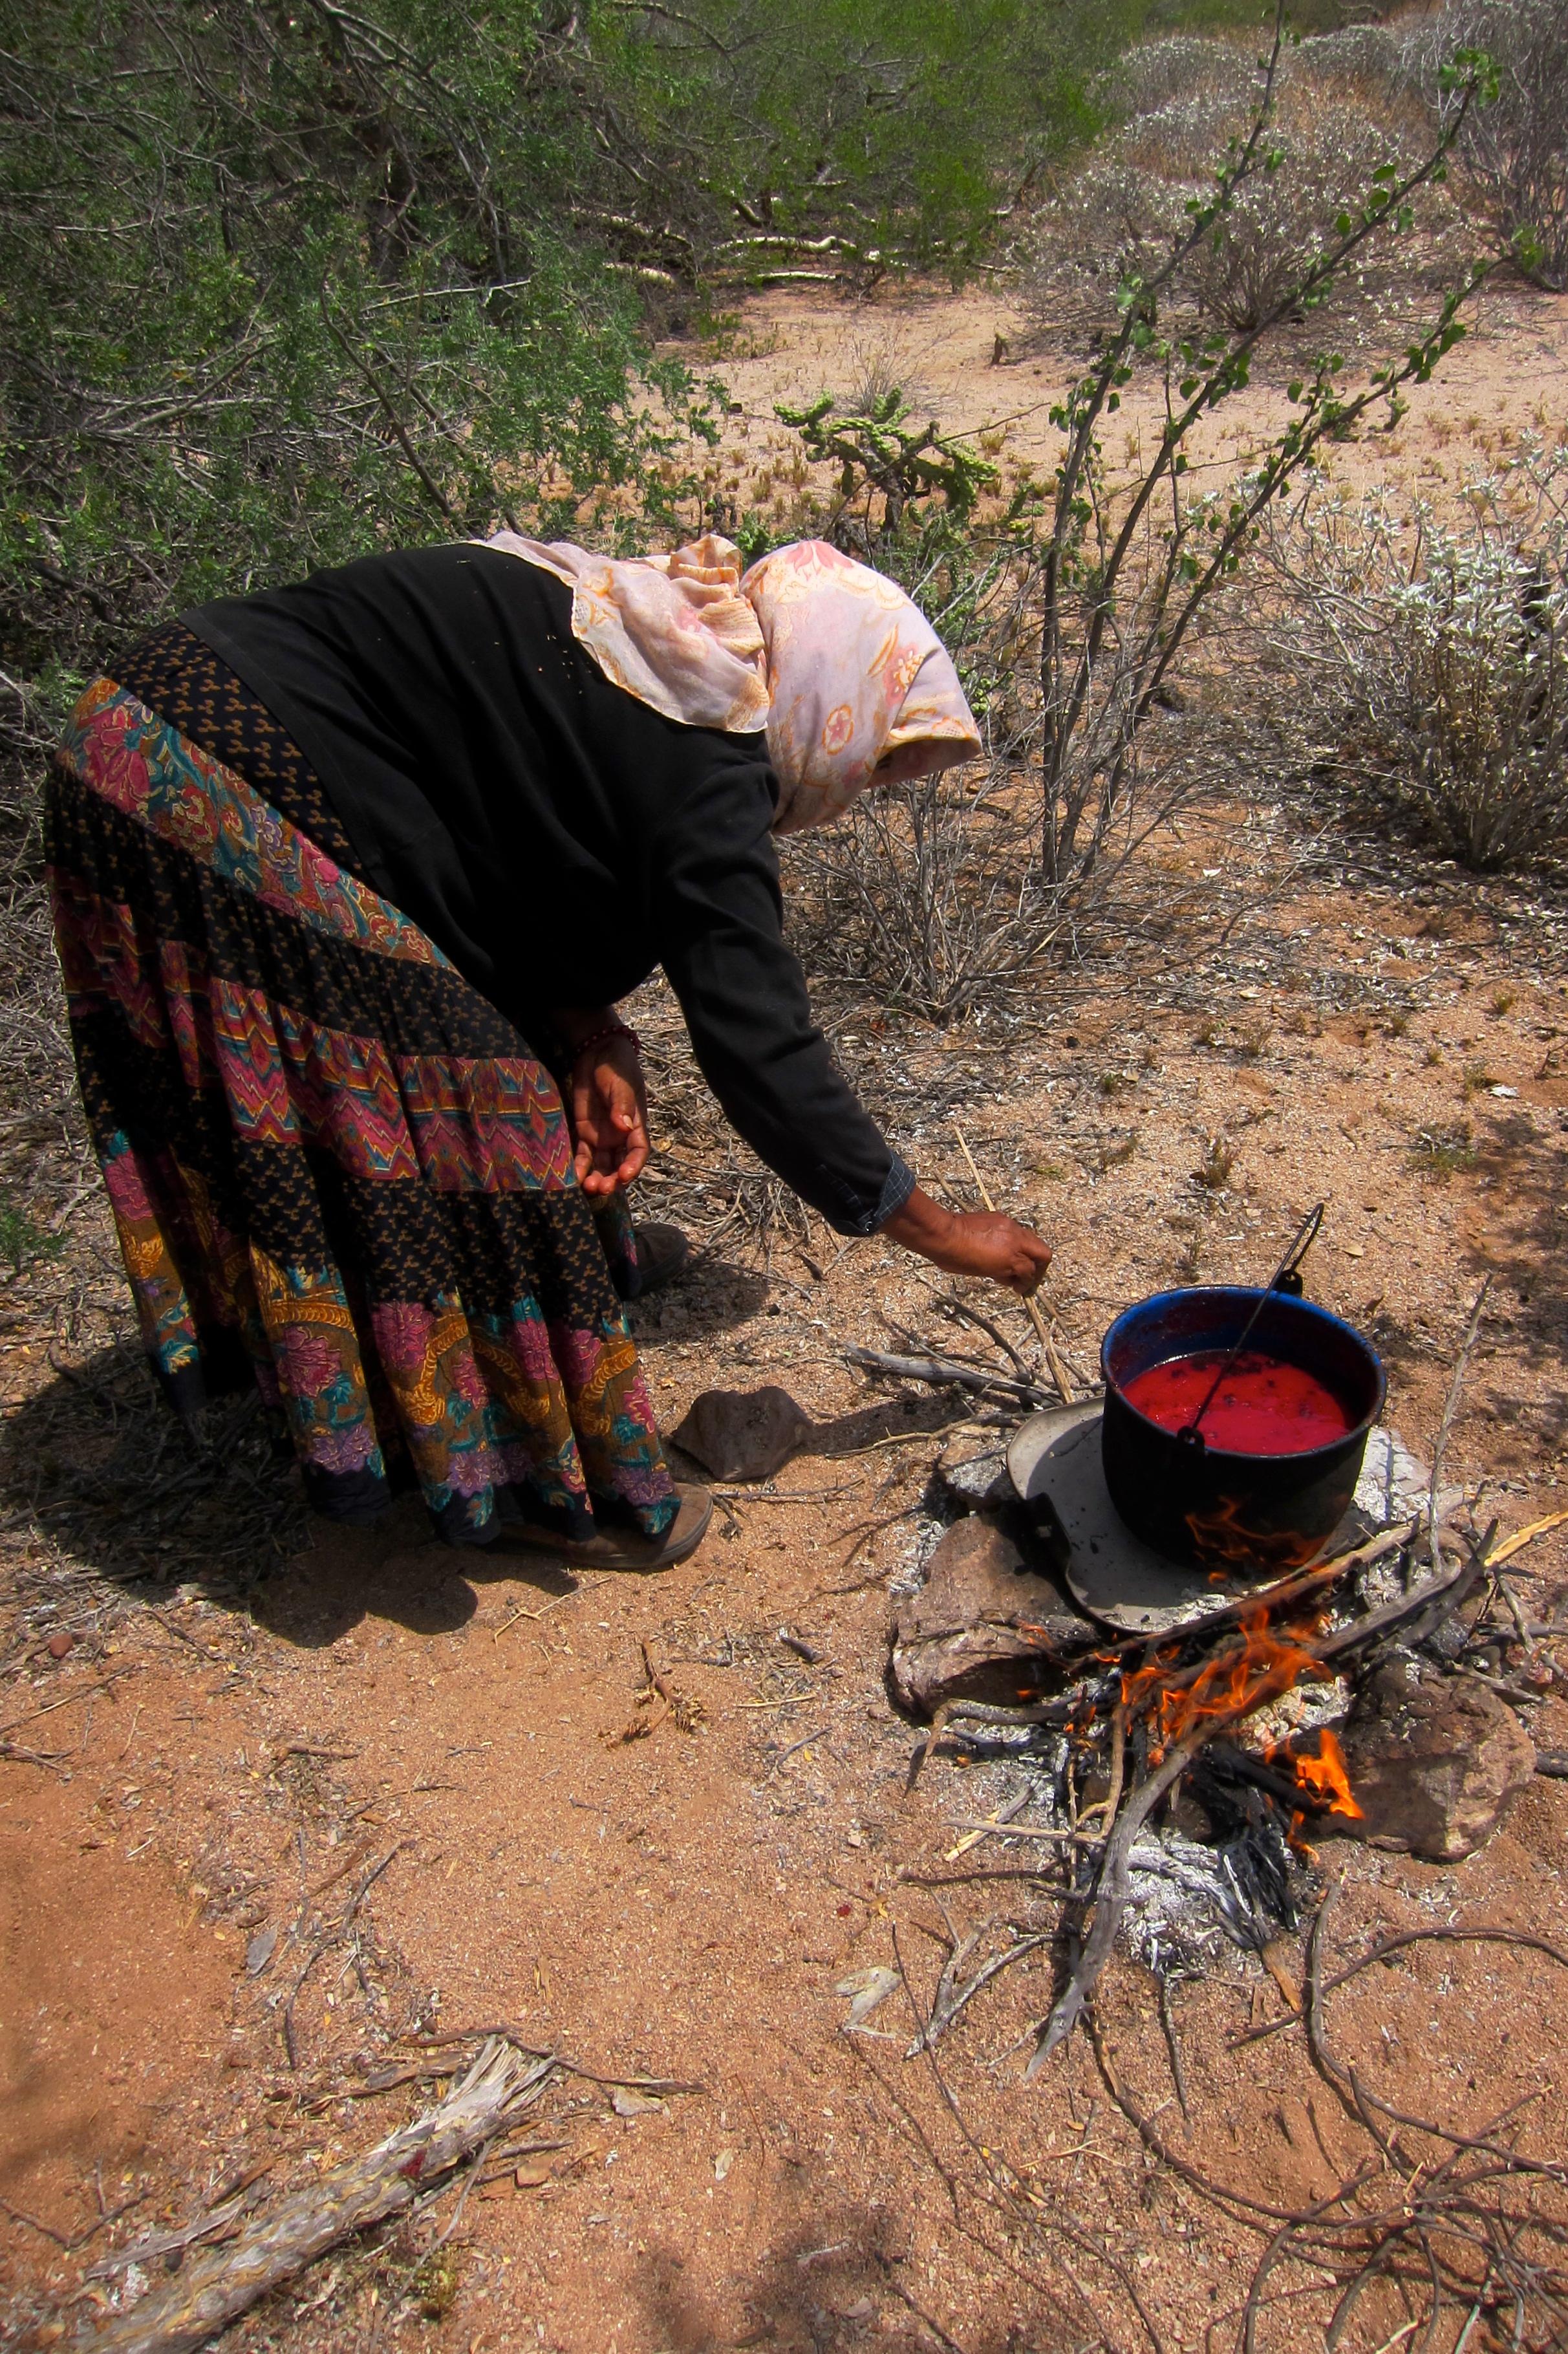 Hortensia stirring pitaya syrup on a previous excursion